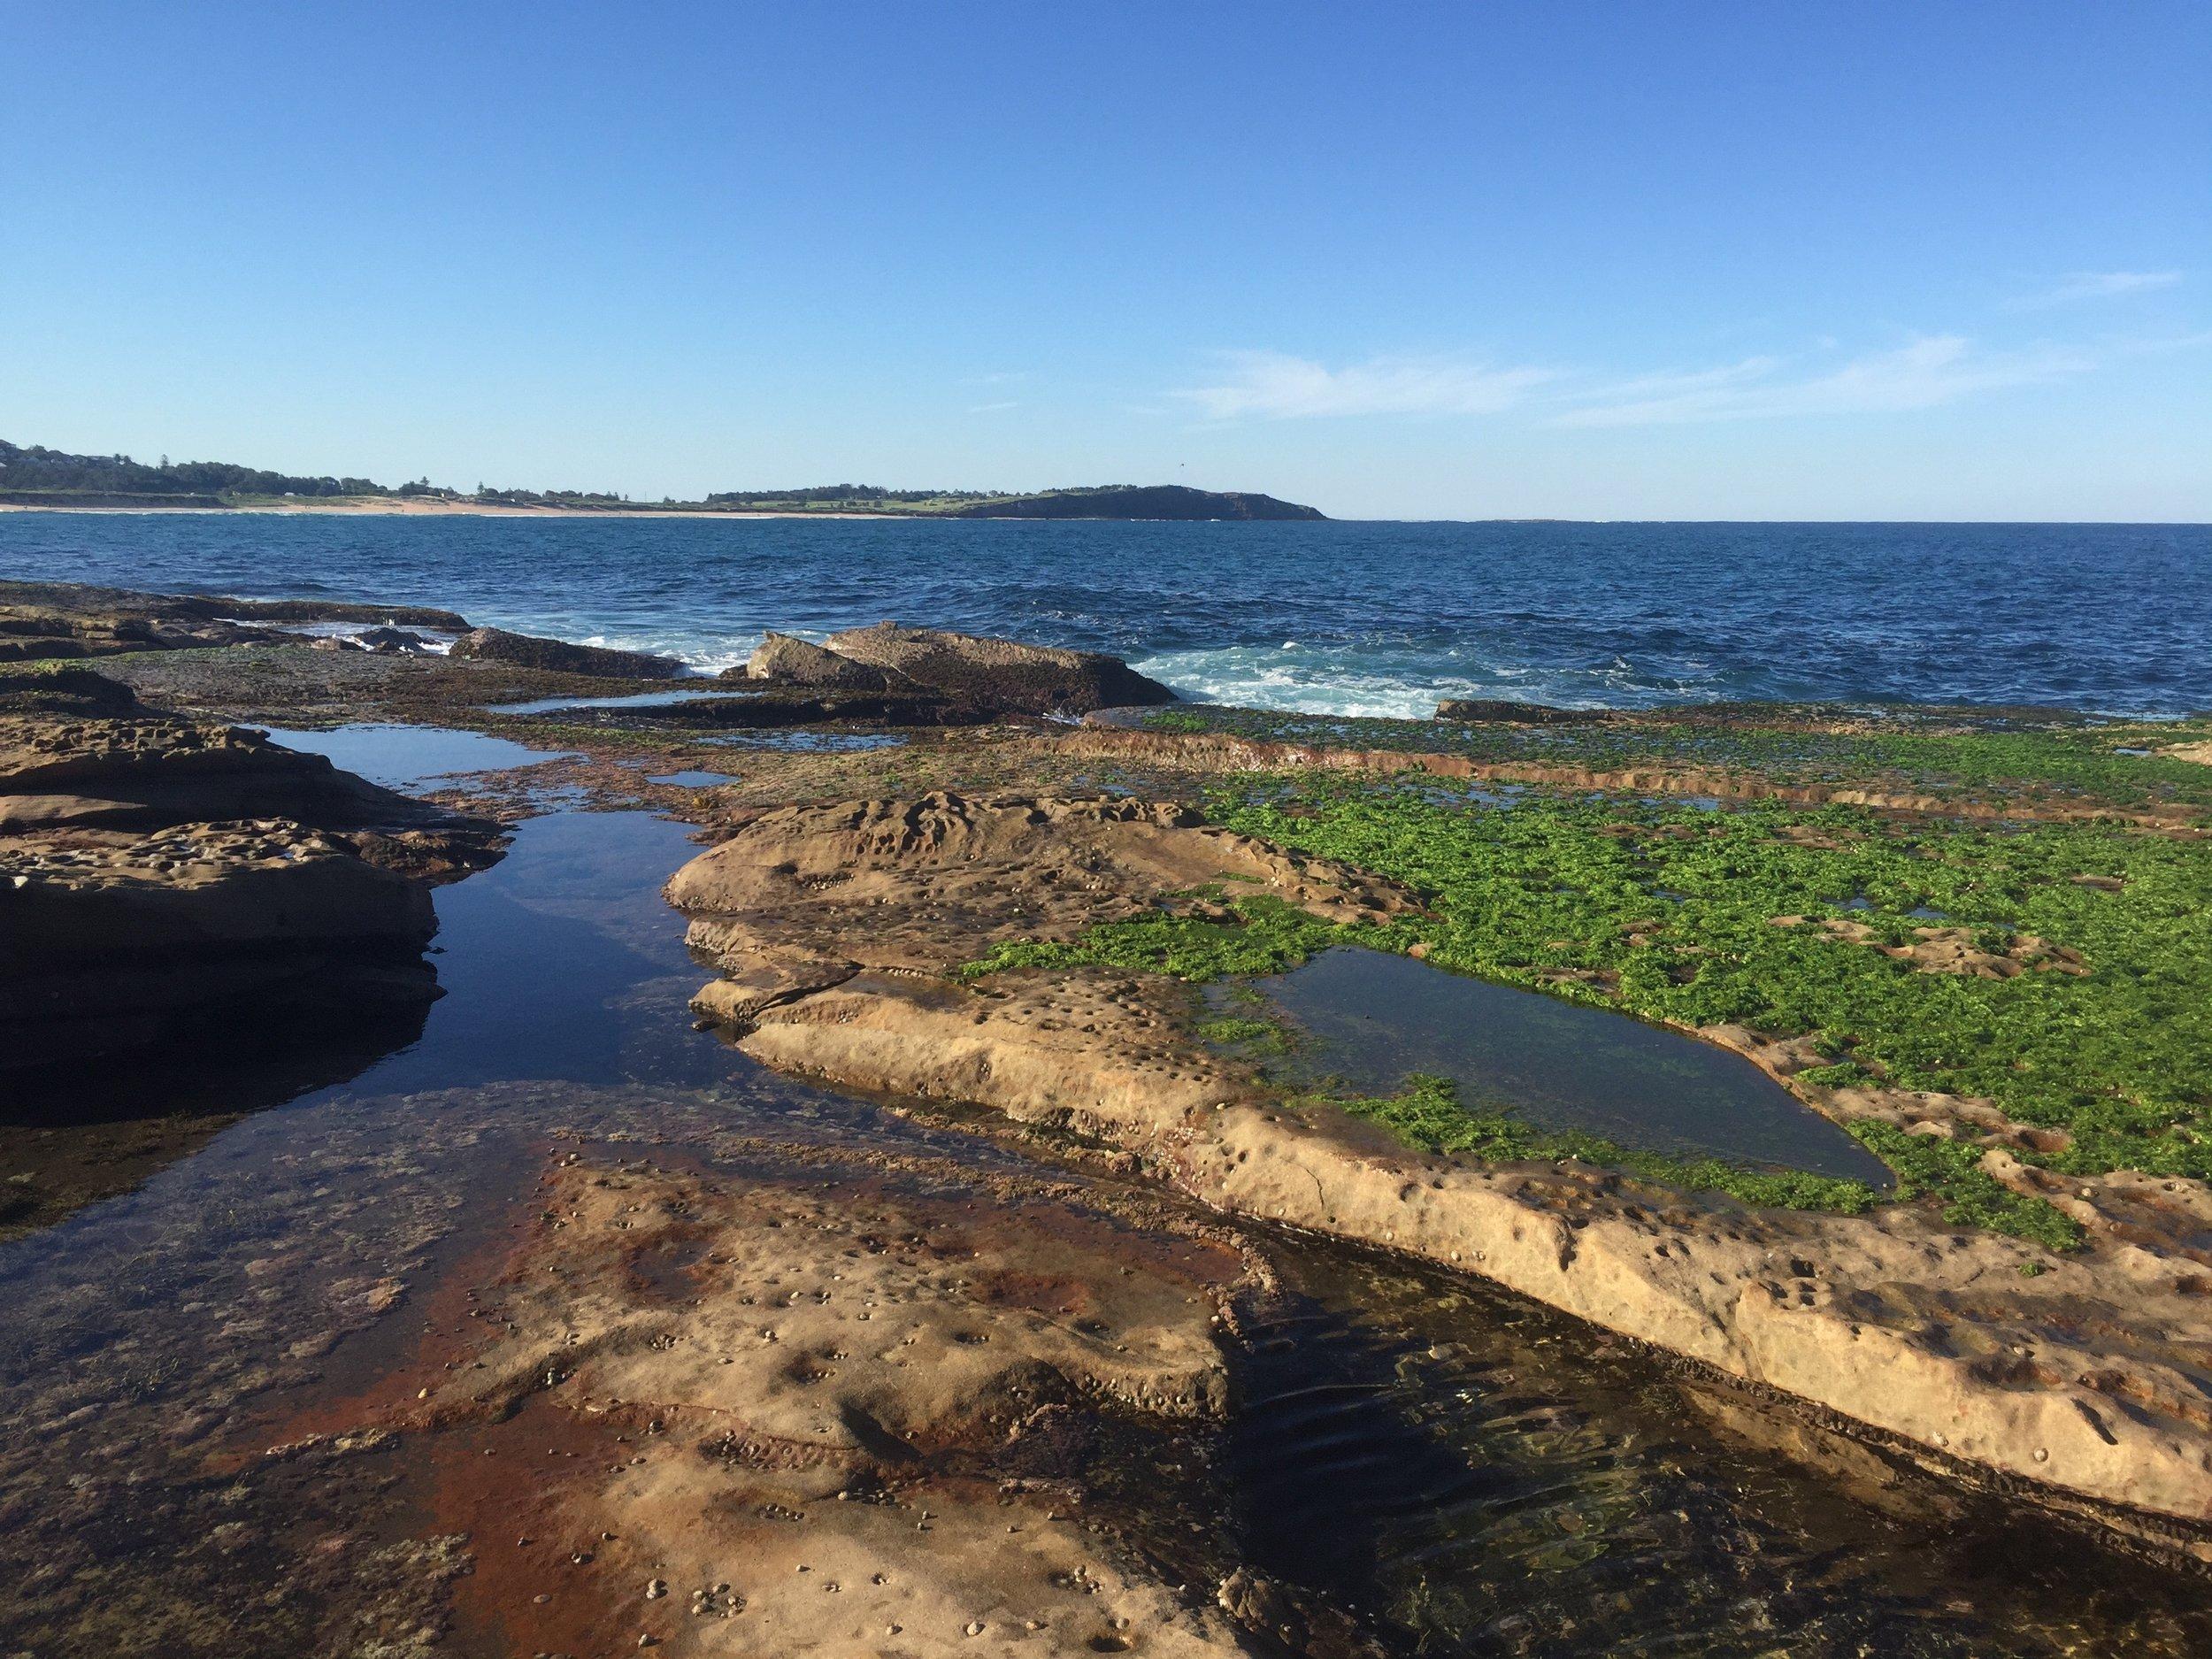 Dee Why Looking Towards Long Reef, NSW